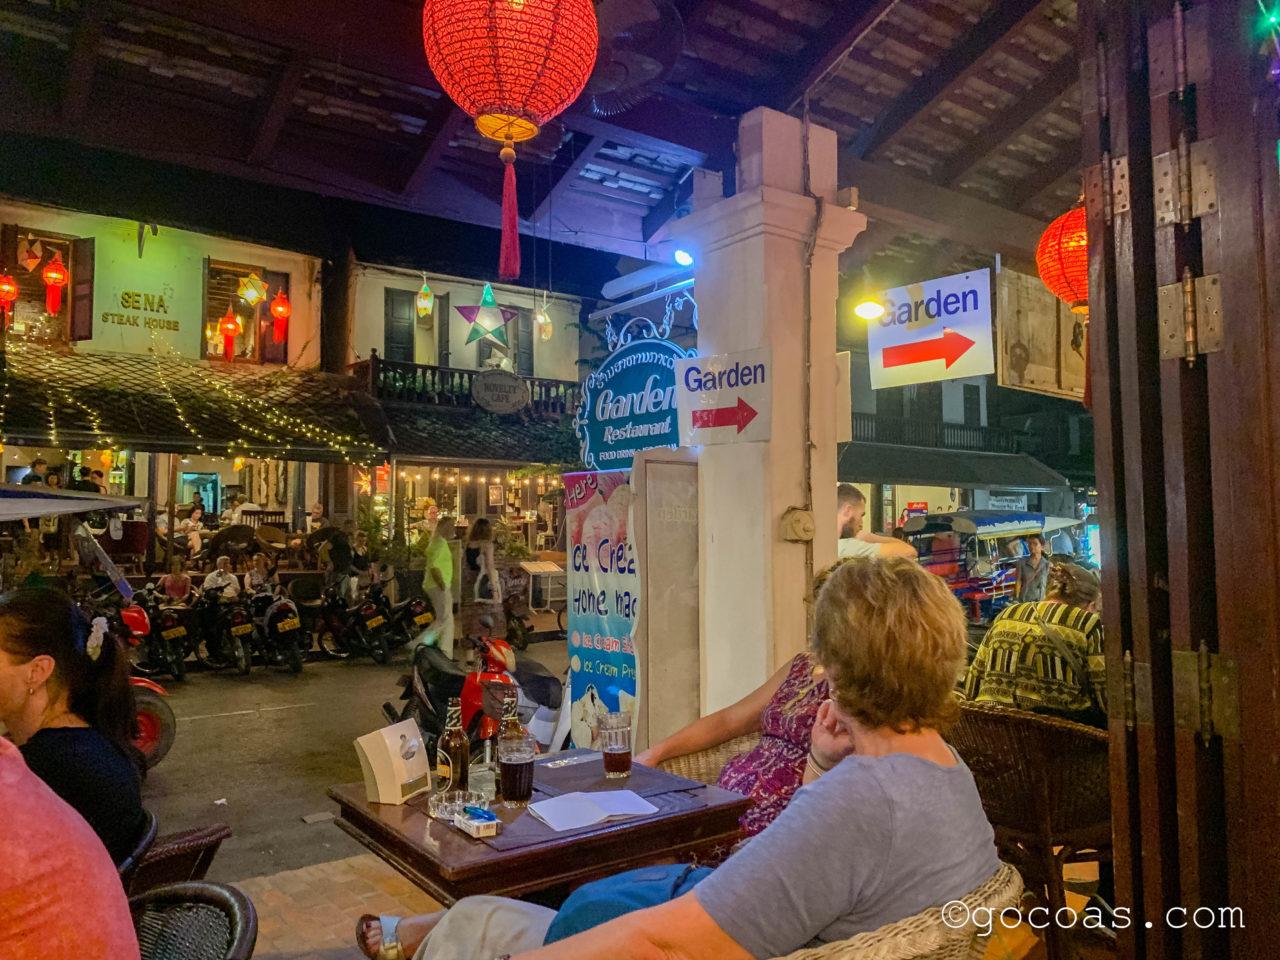 Garden Restaurantのテラス席で談笑する外国人客